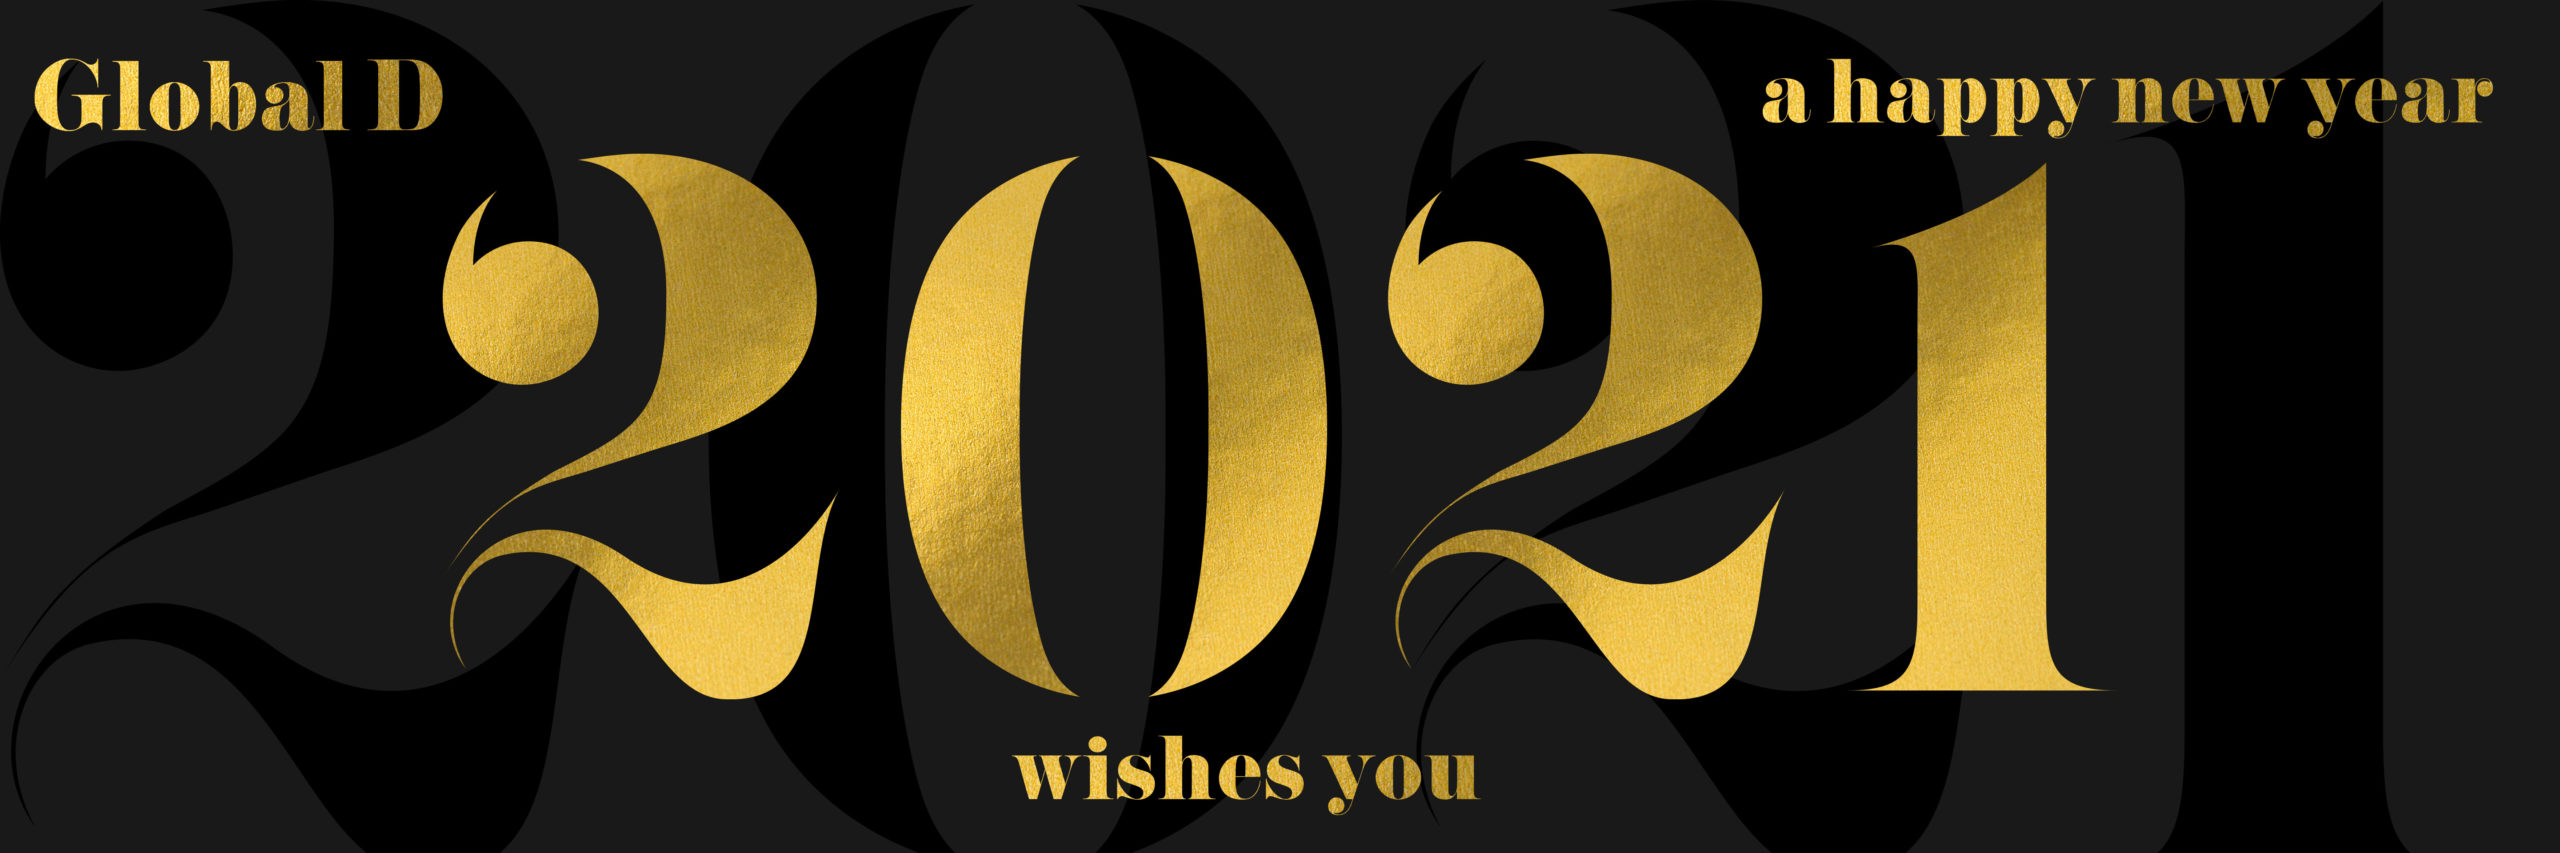 🎉 HAPPY NEW YEAR!!! 🎉